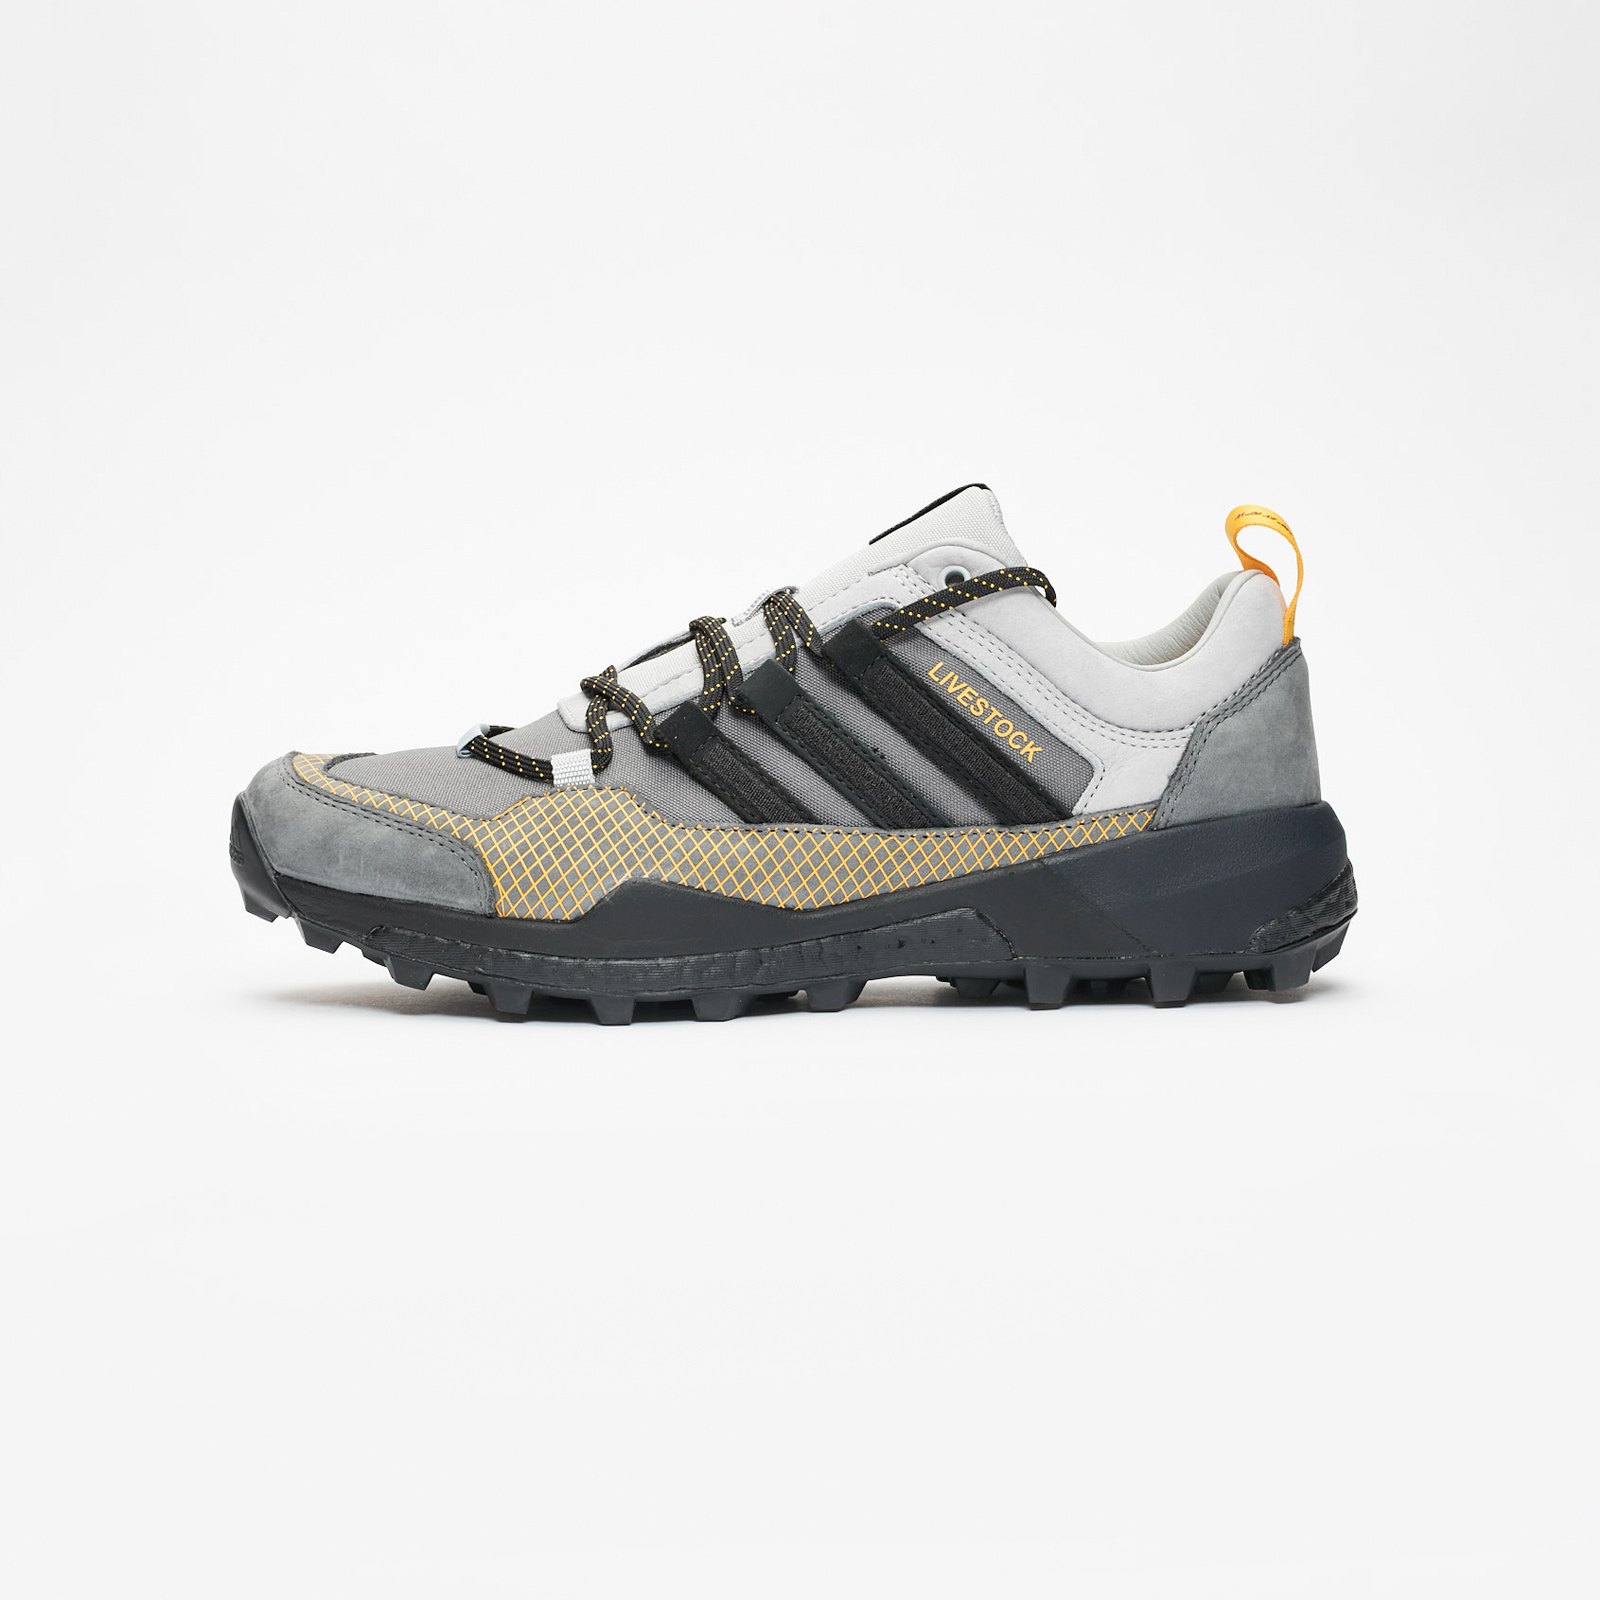 adidas Terrex Skychaser LIVESTOCK B37853 Sneakersnstuff